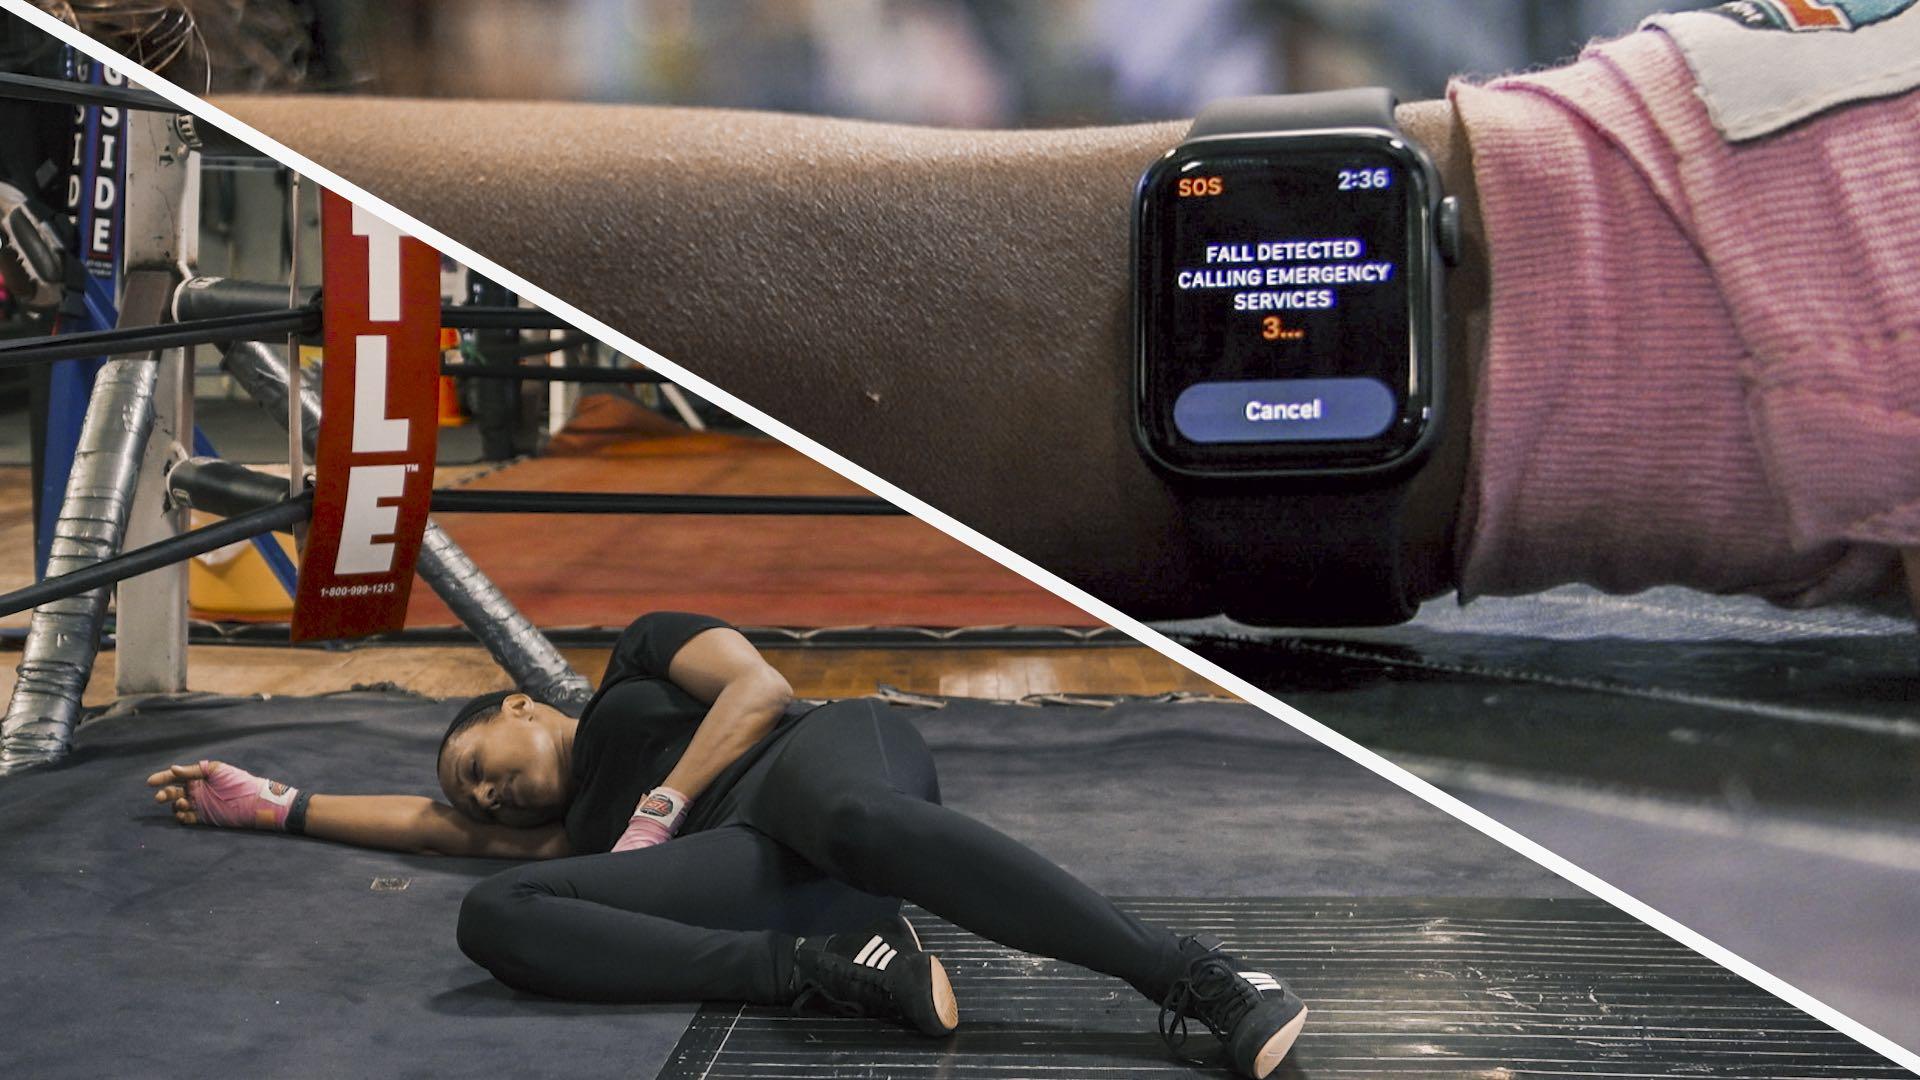 Apple Watch fall detection - hero image